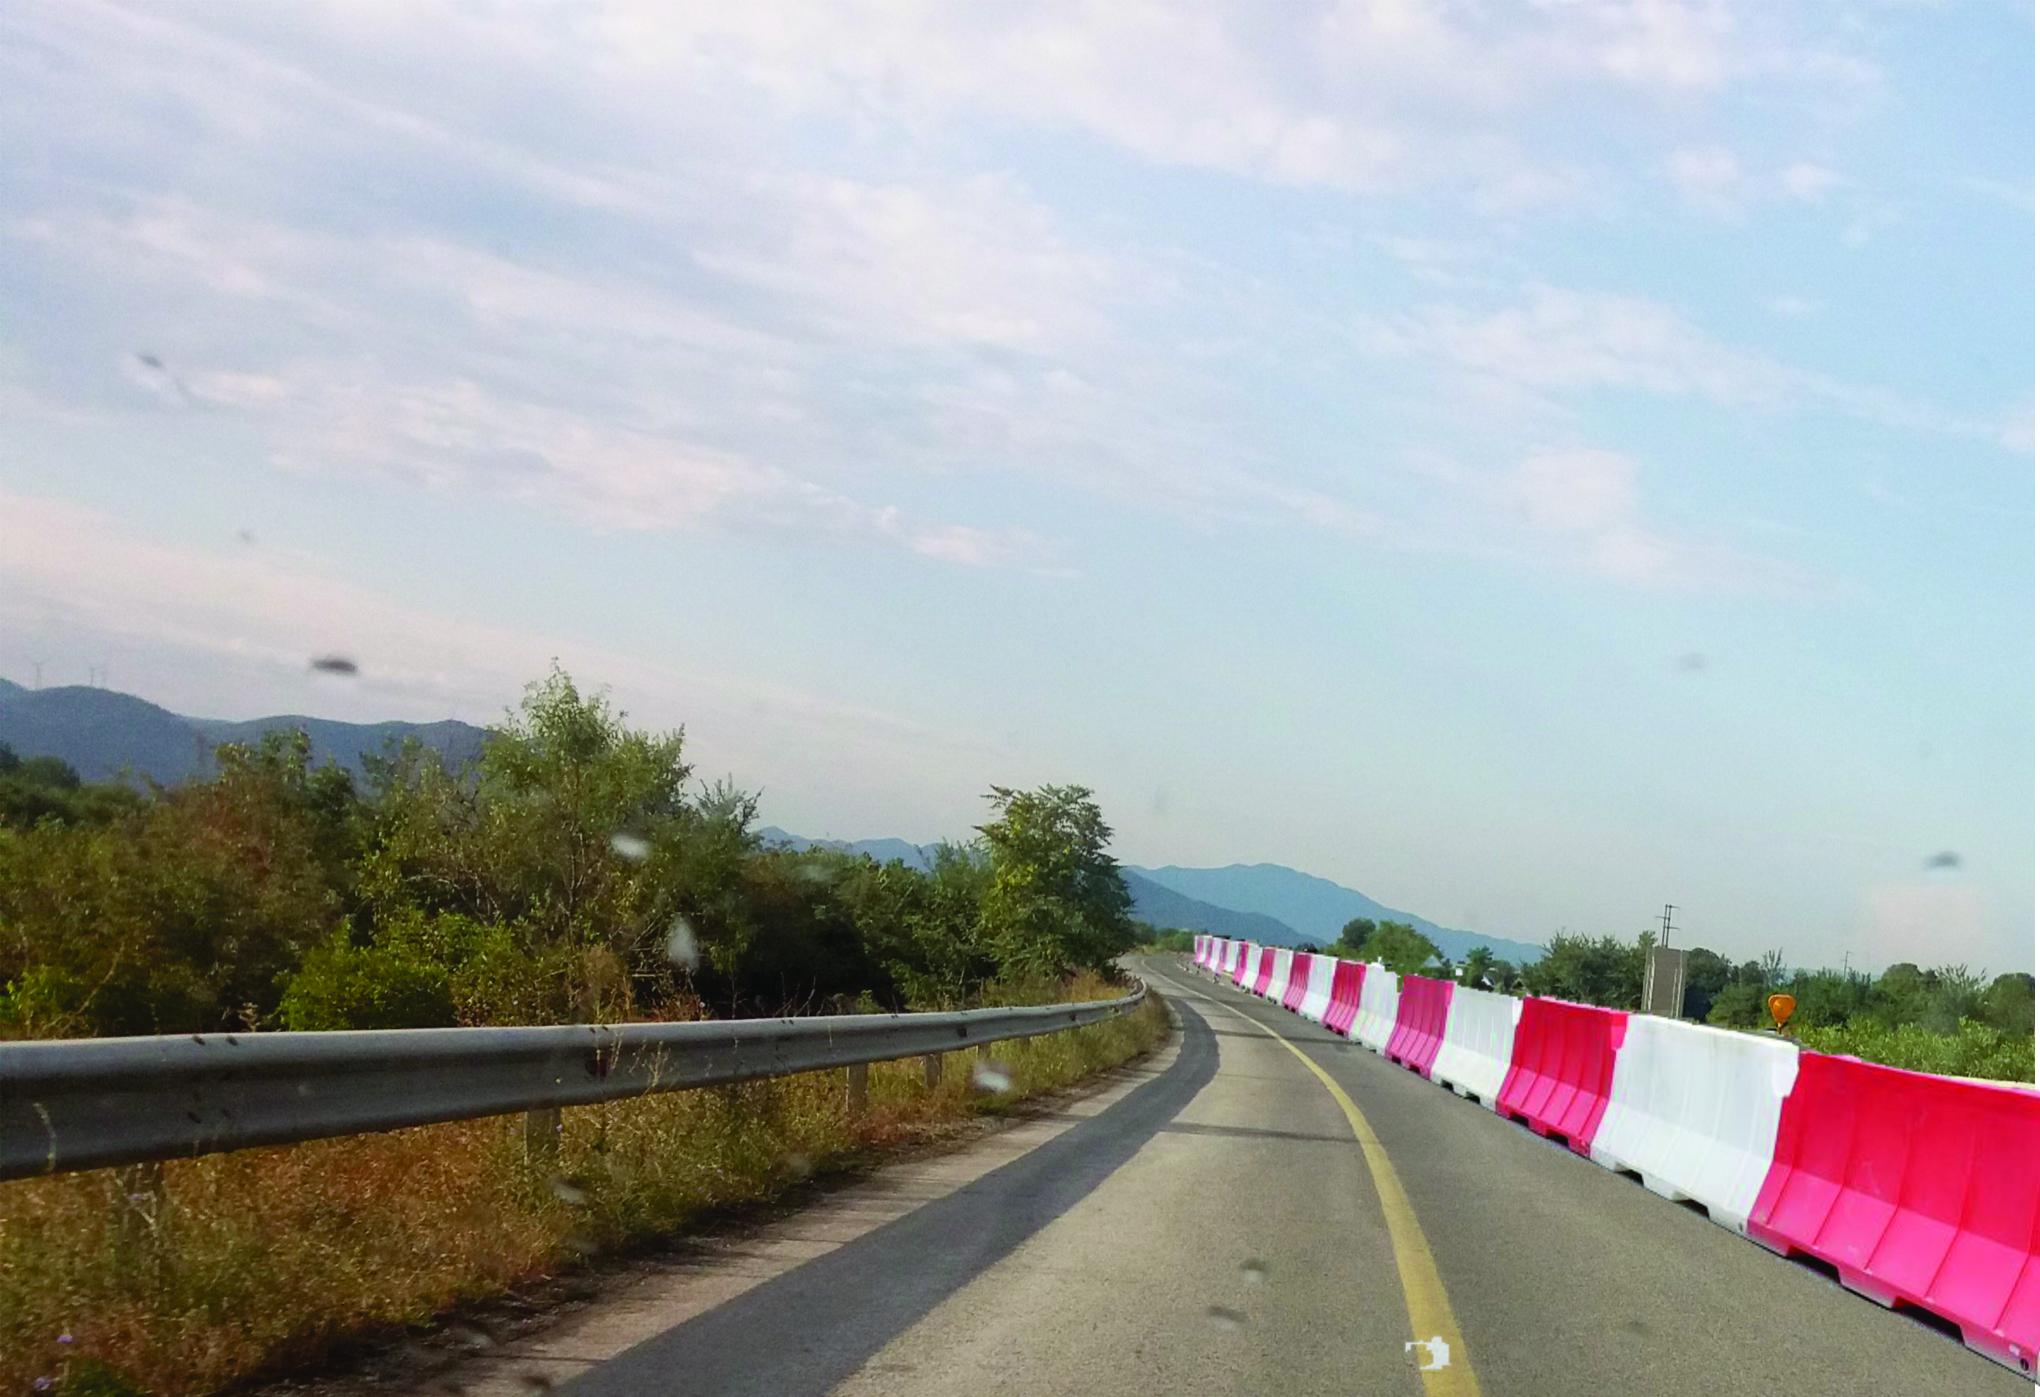 barieri 1500 2000 barriers